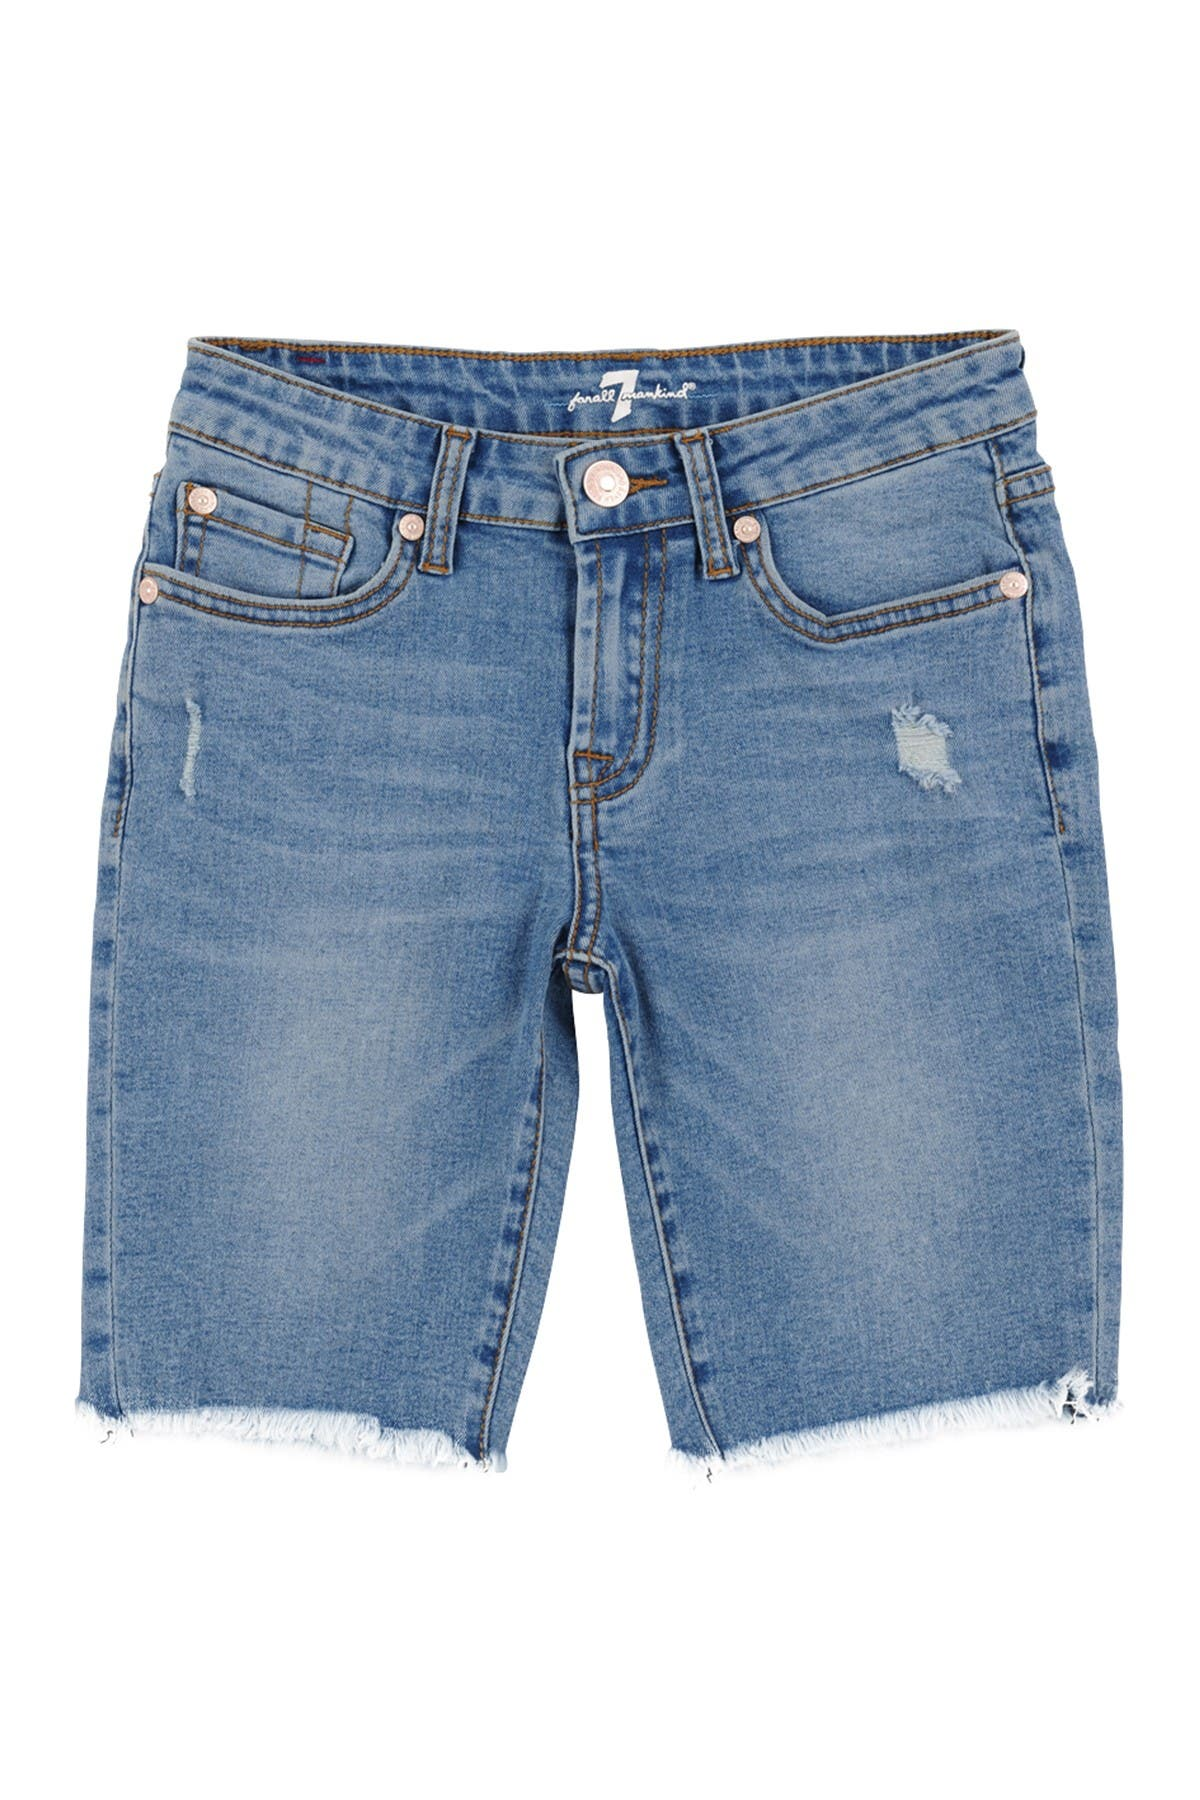 Image of 7 For All Mankind Raw Hem Denim Shorts